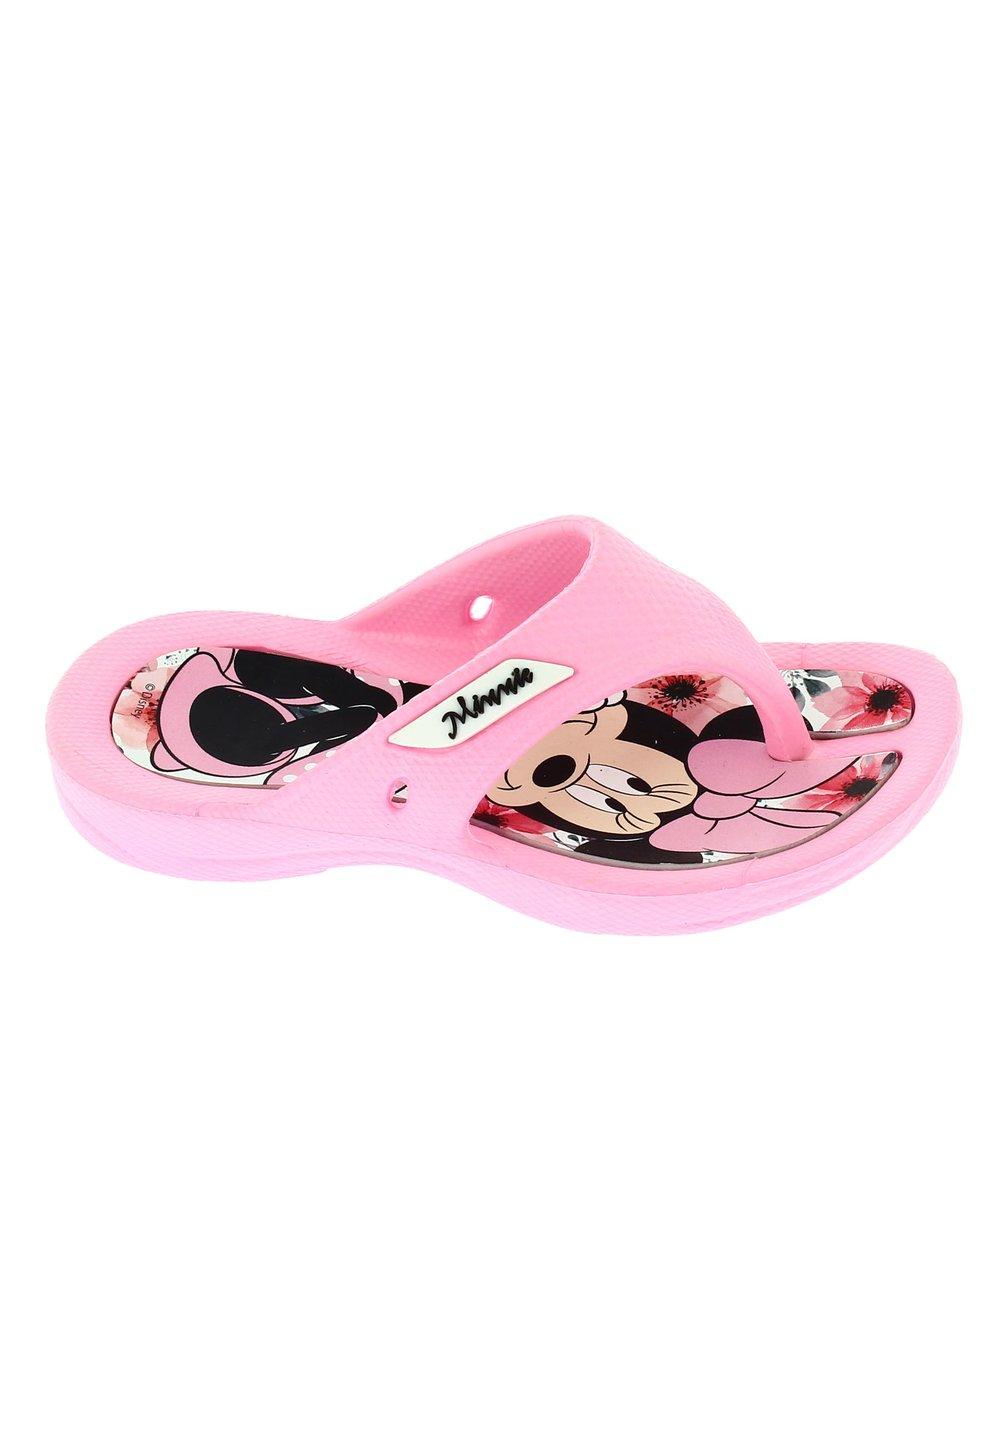 Papuci flip flop, Minnie, roz deschis imagine